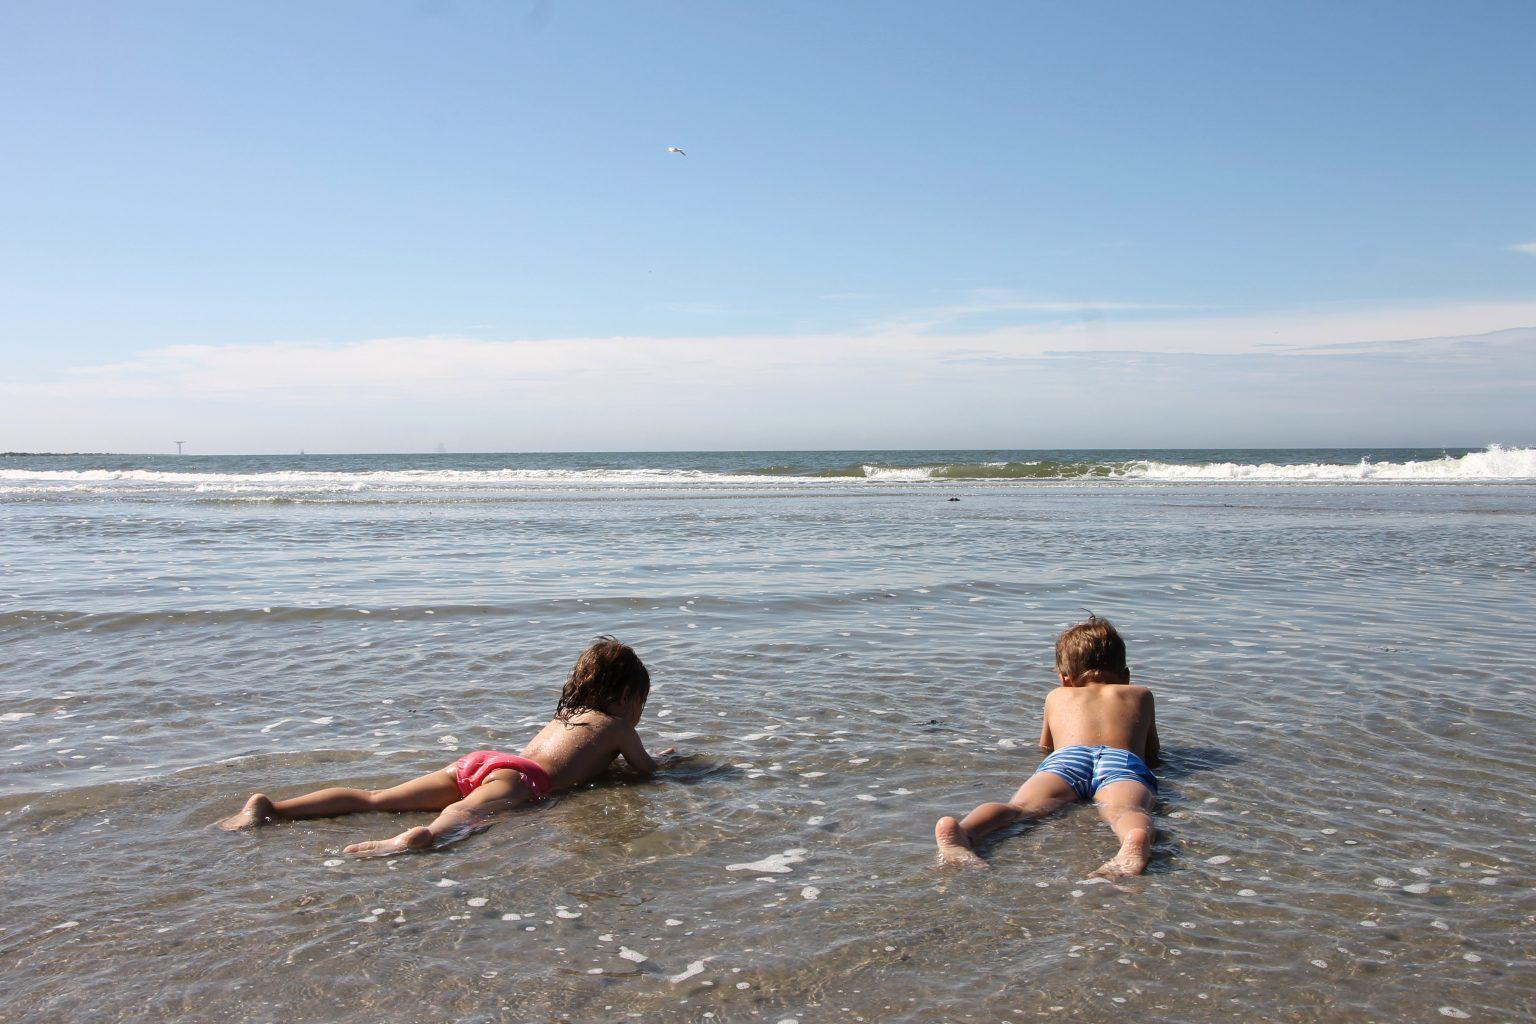 Urlaub am Strand Tipps